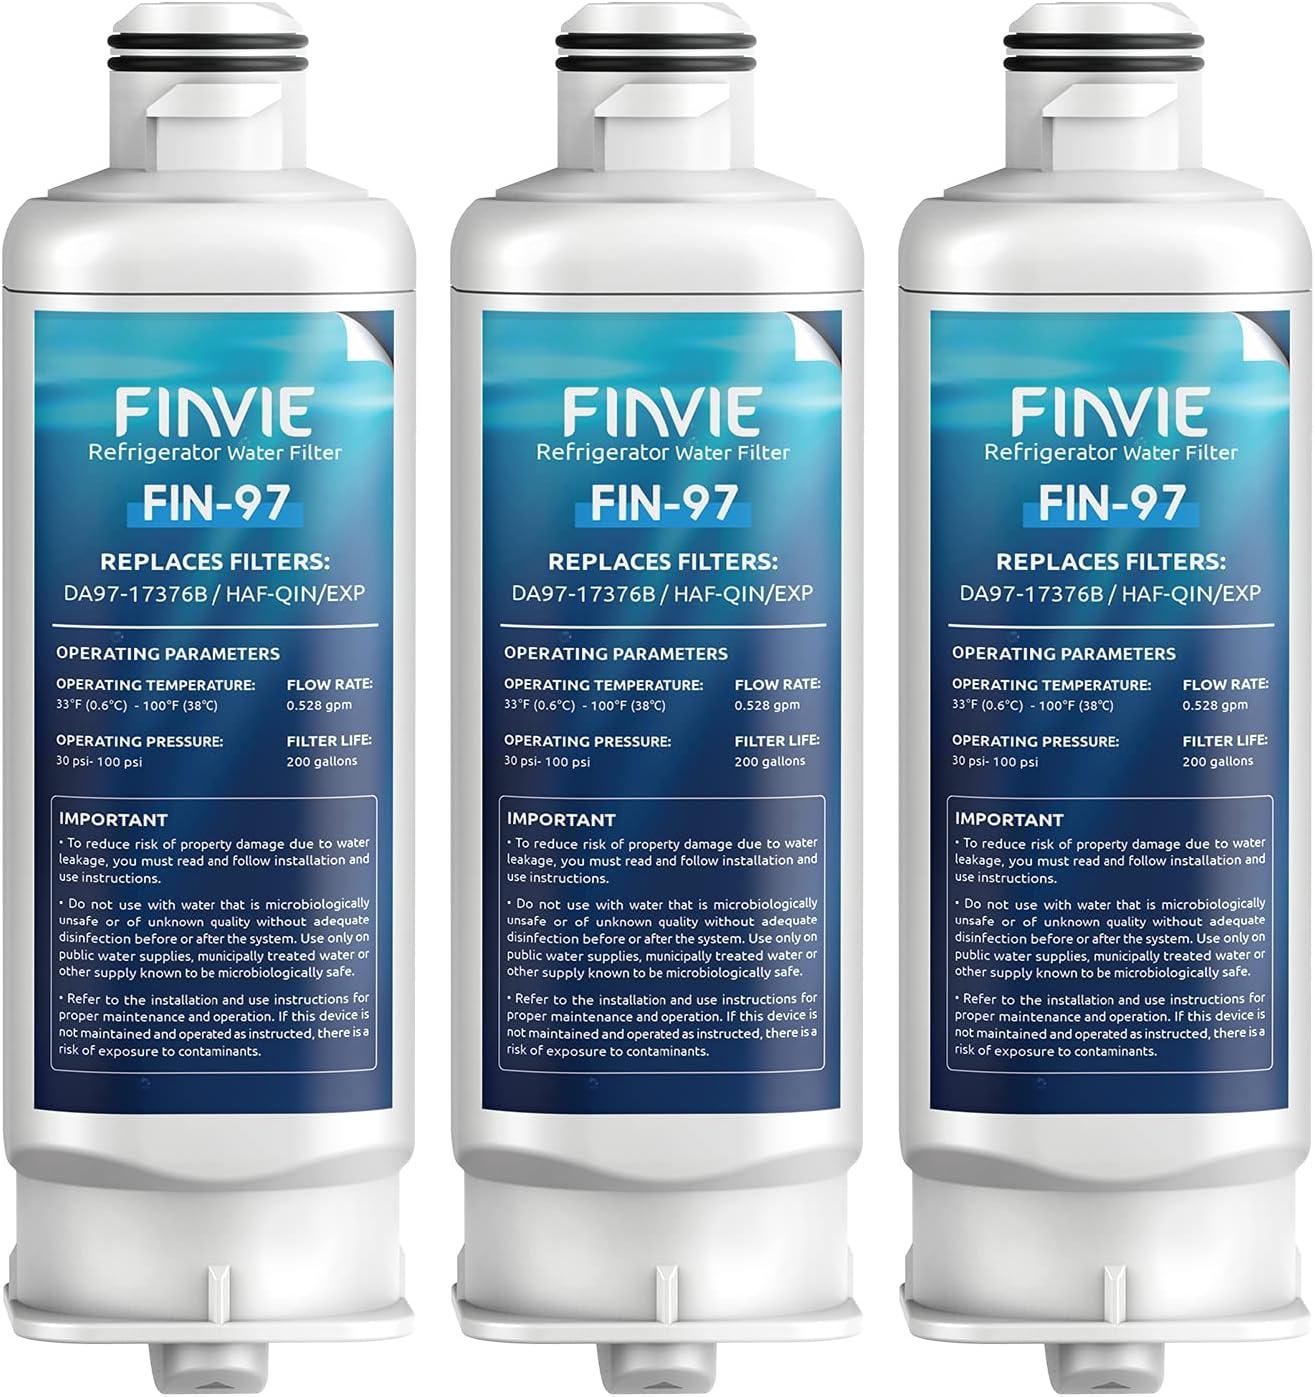 FINVIE DA97-17376B Refrigerator Water Sam for Replacement free Filter Genuine